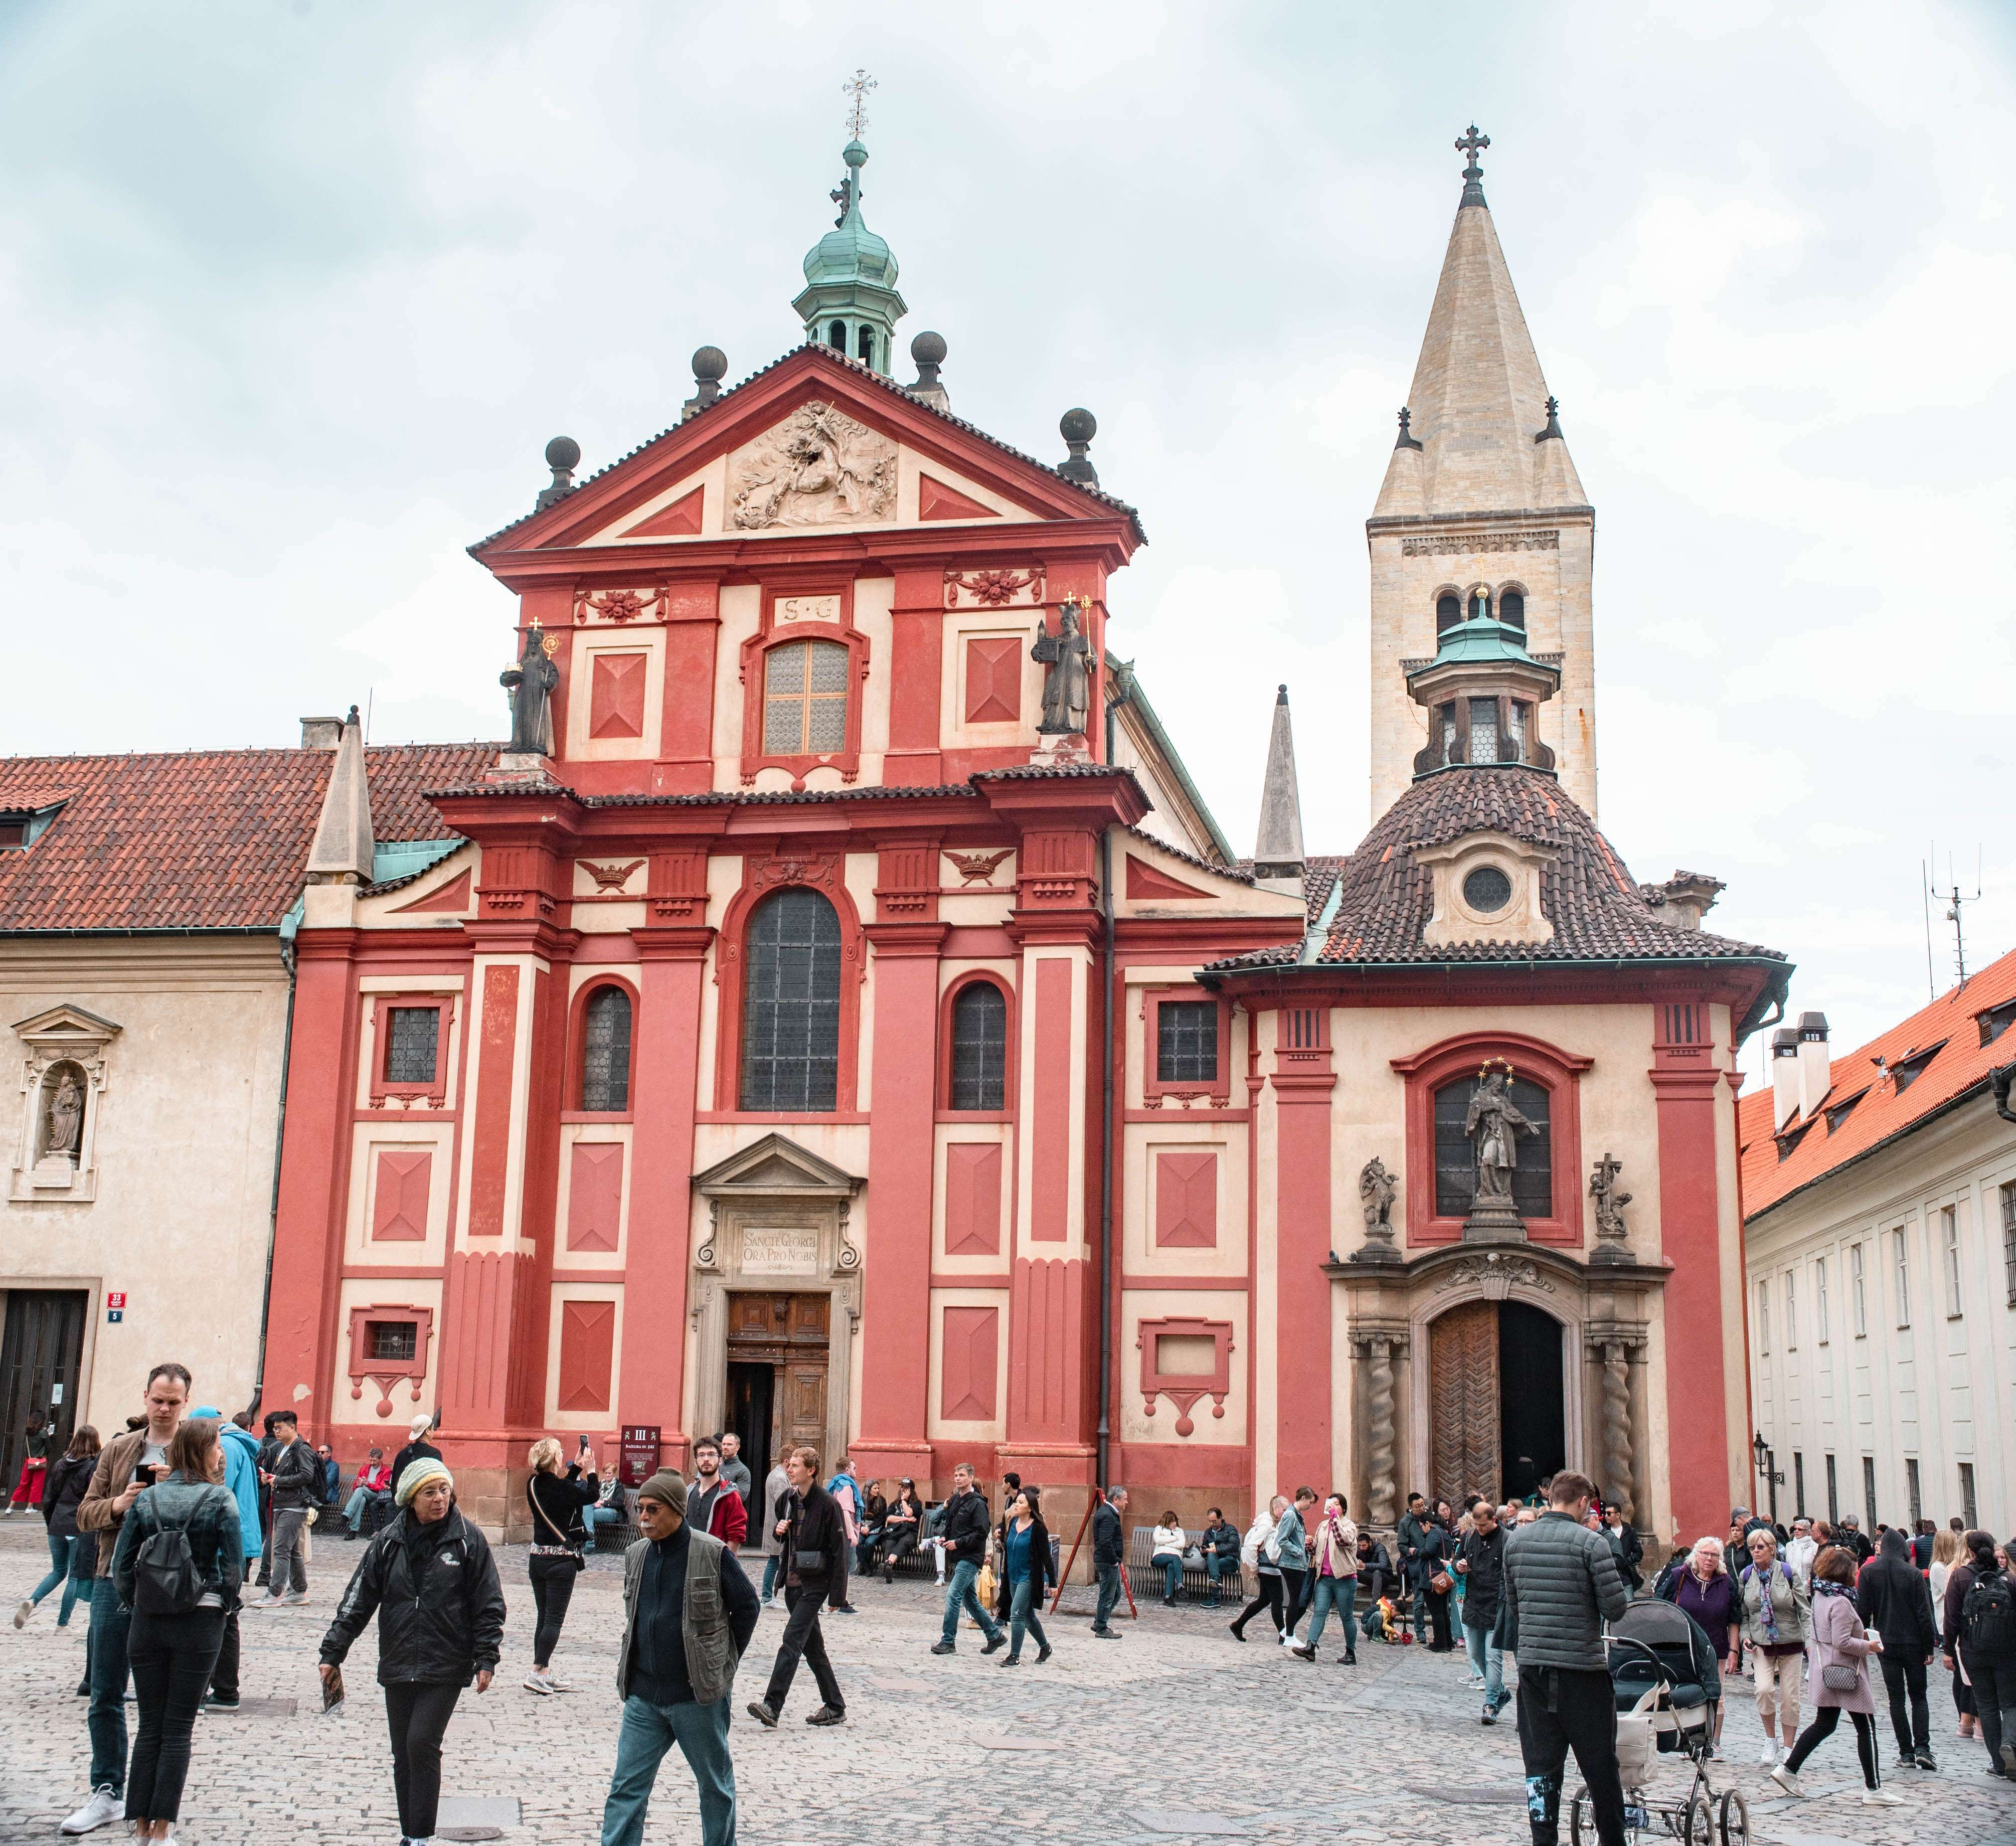 St. George's Basilica, Prague Castle